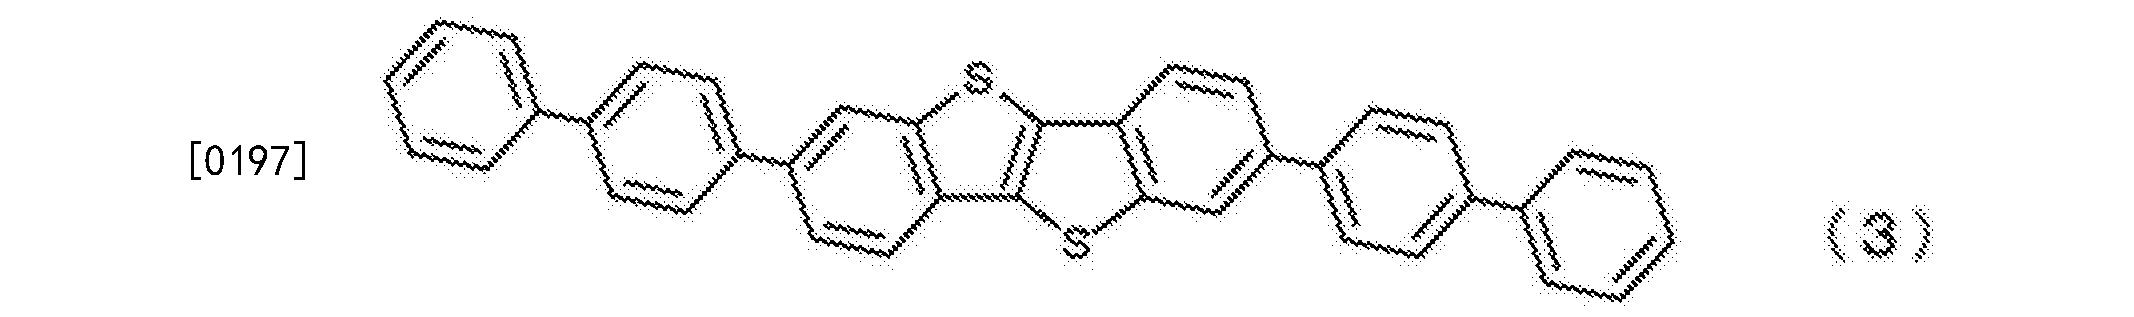 Figure CN107534050AD00261